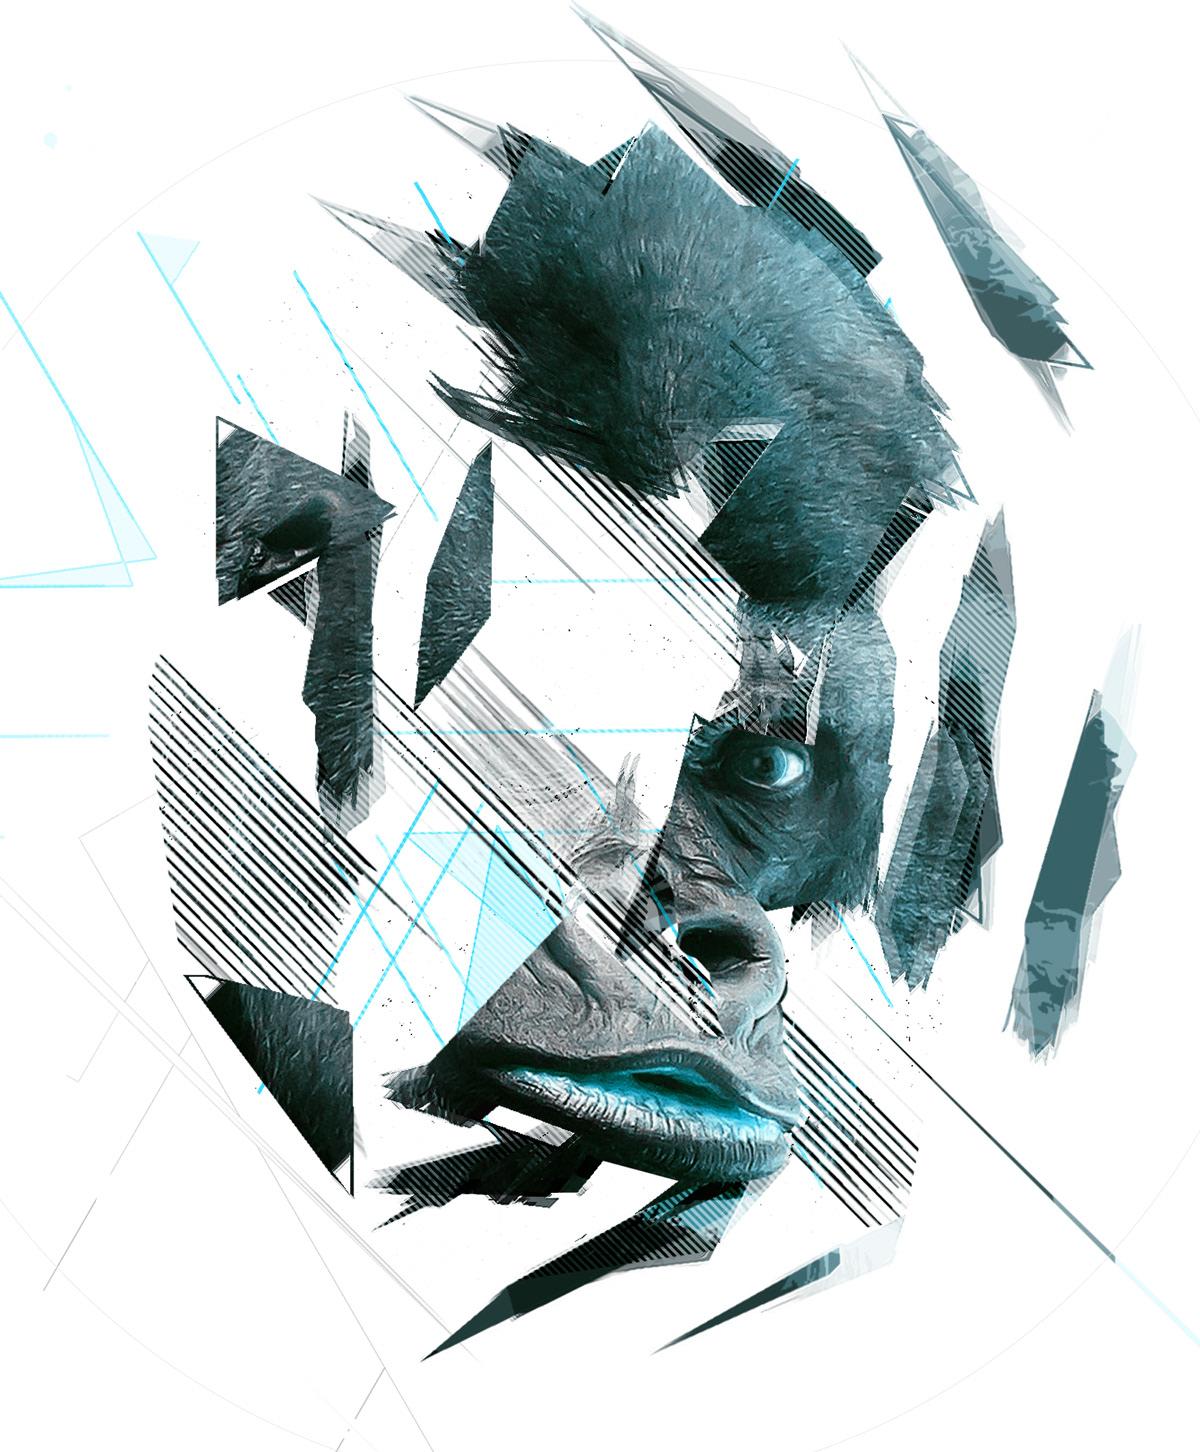 Geometric Dispersion FX - Photoshop Add-On on Behance